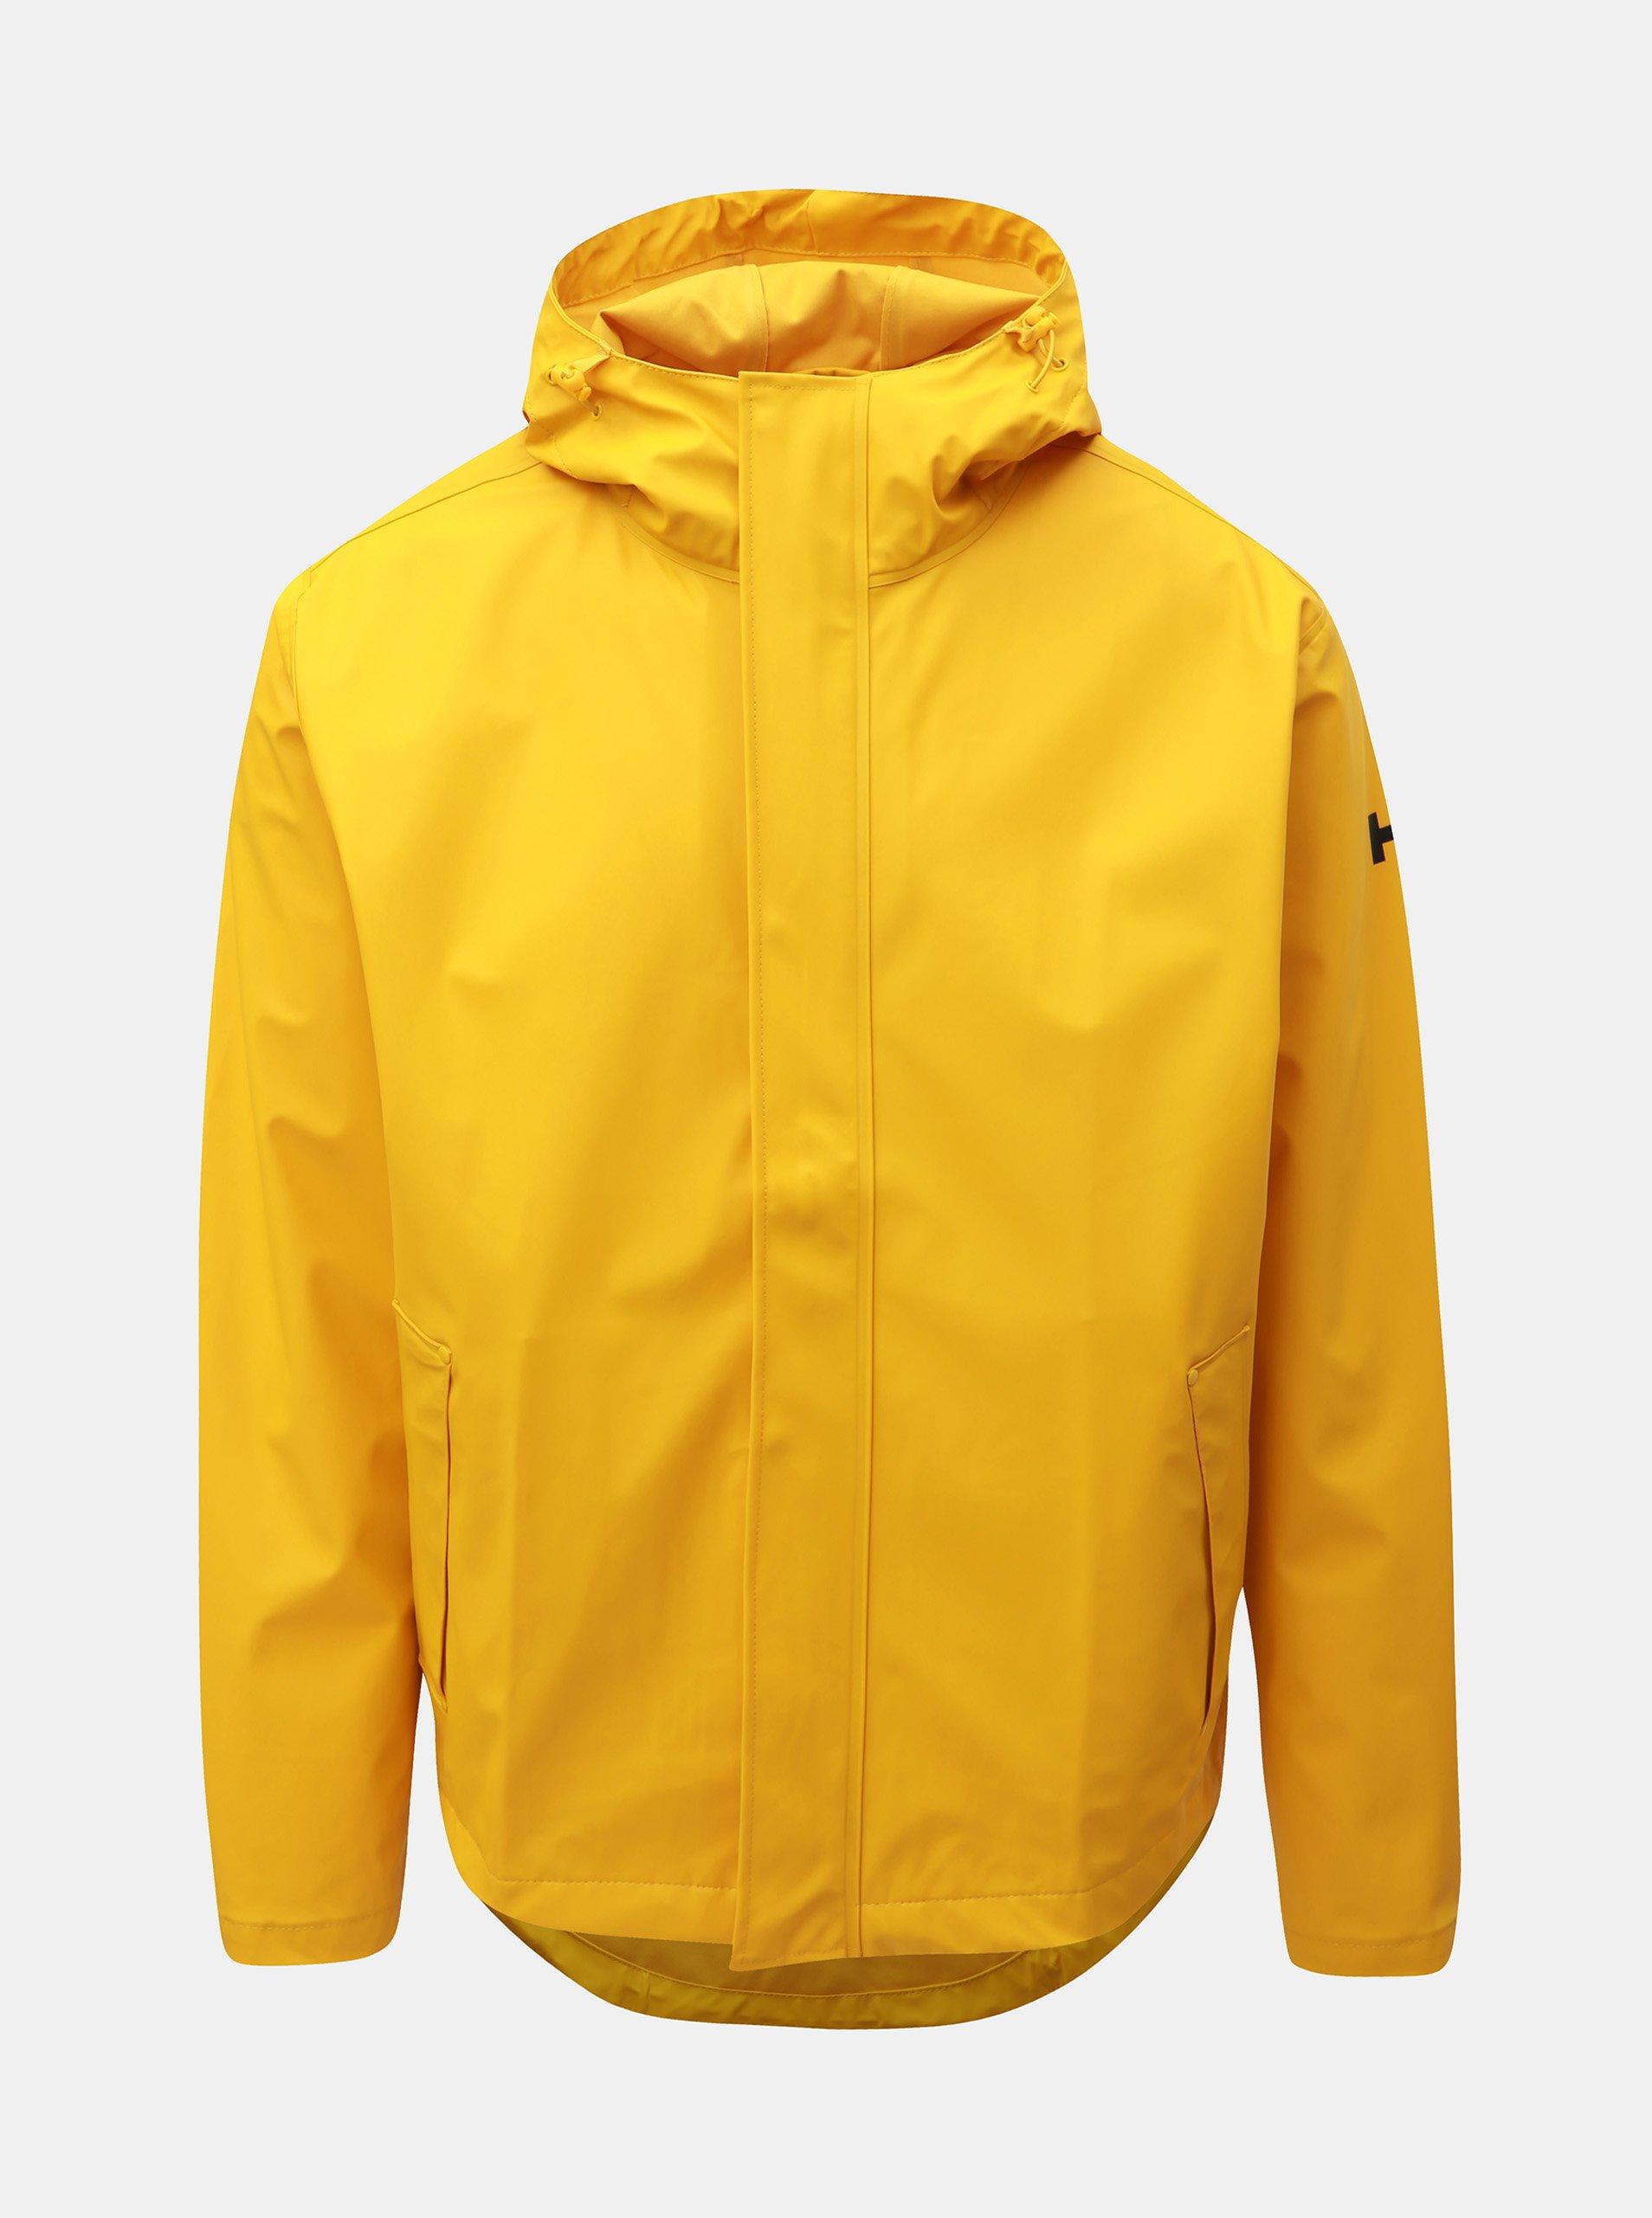 Žlutá pánská lehká bunda HELLY HANSEN